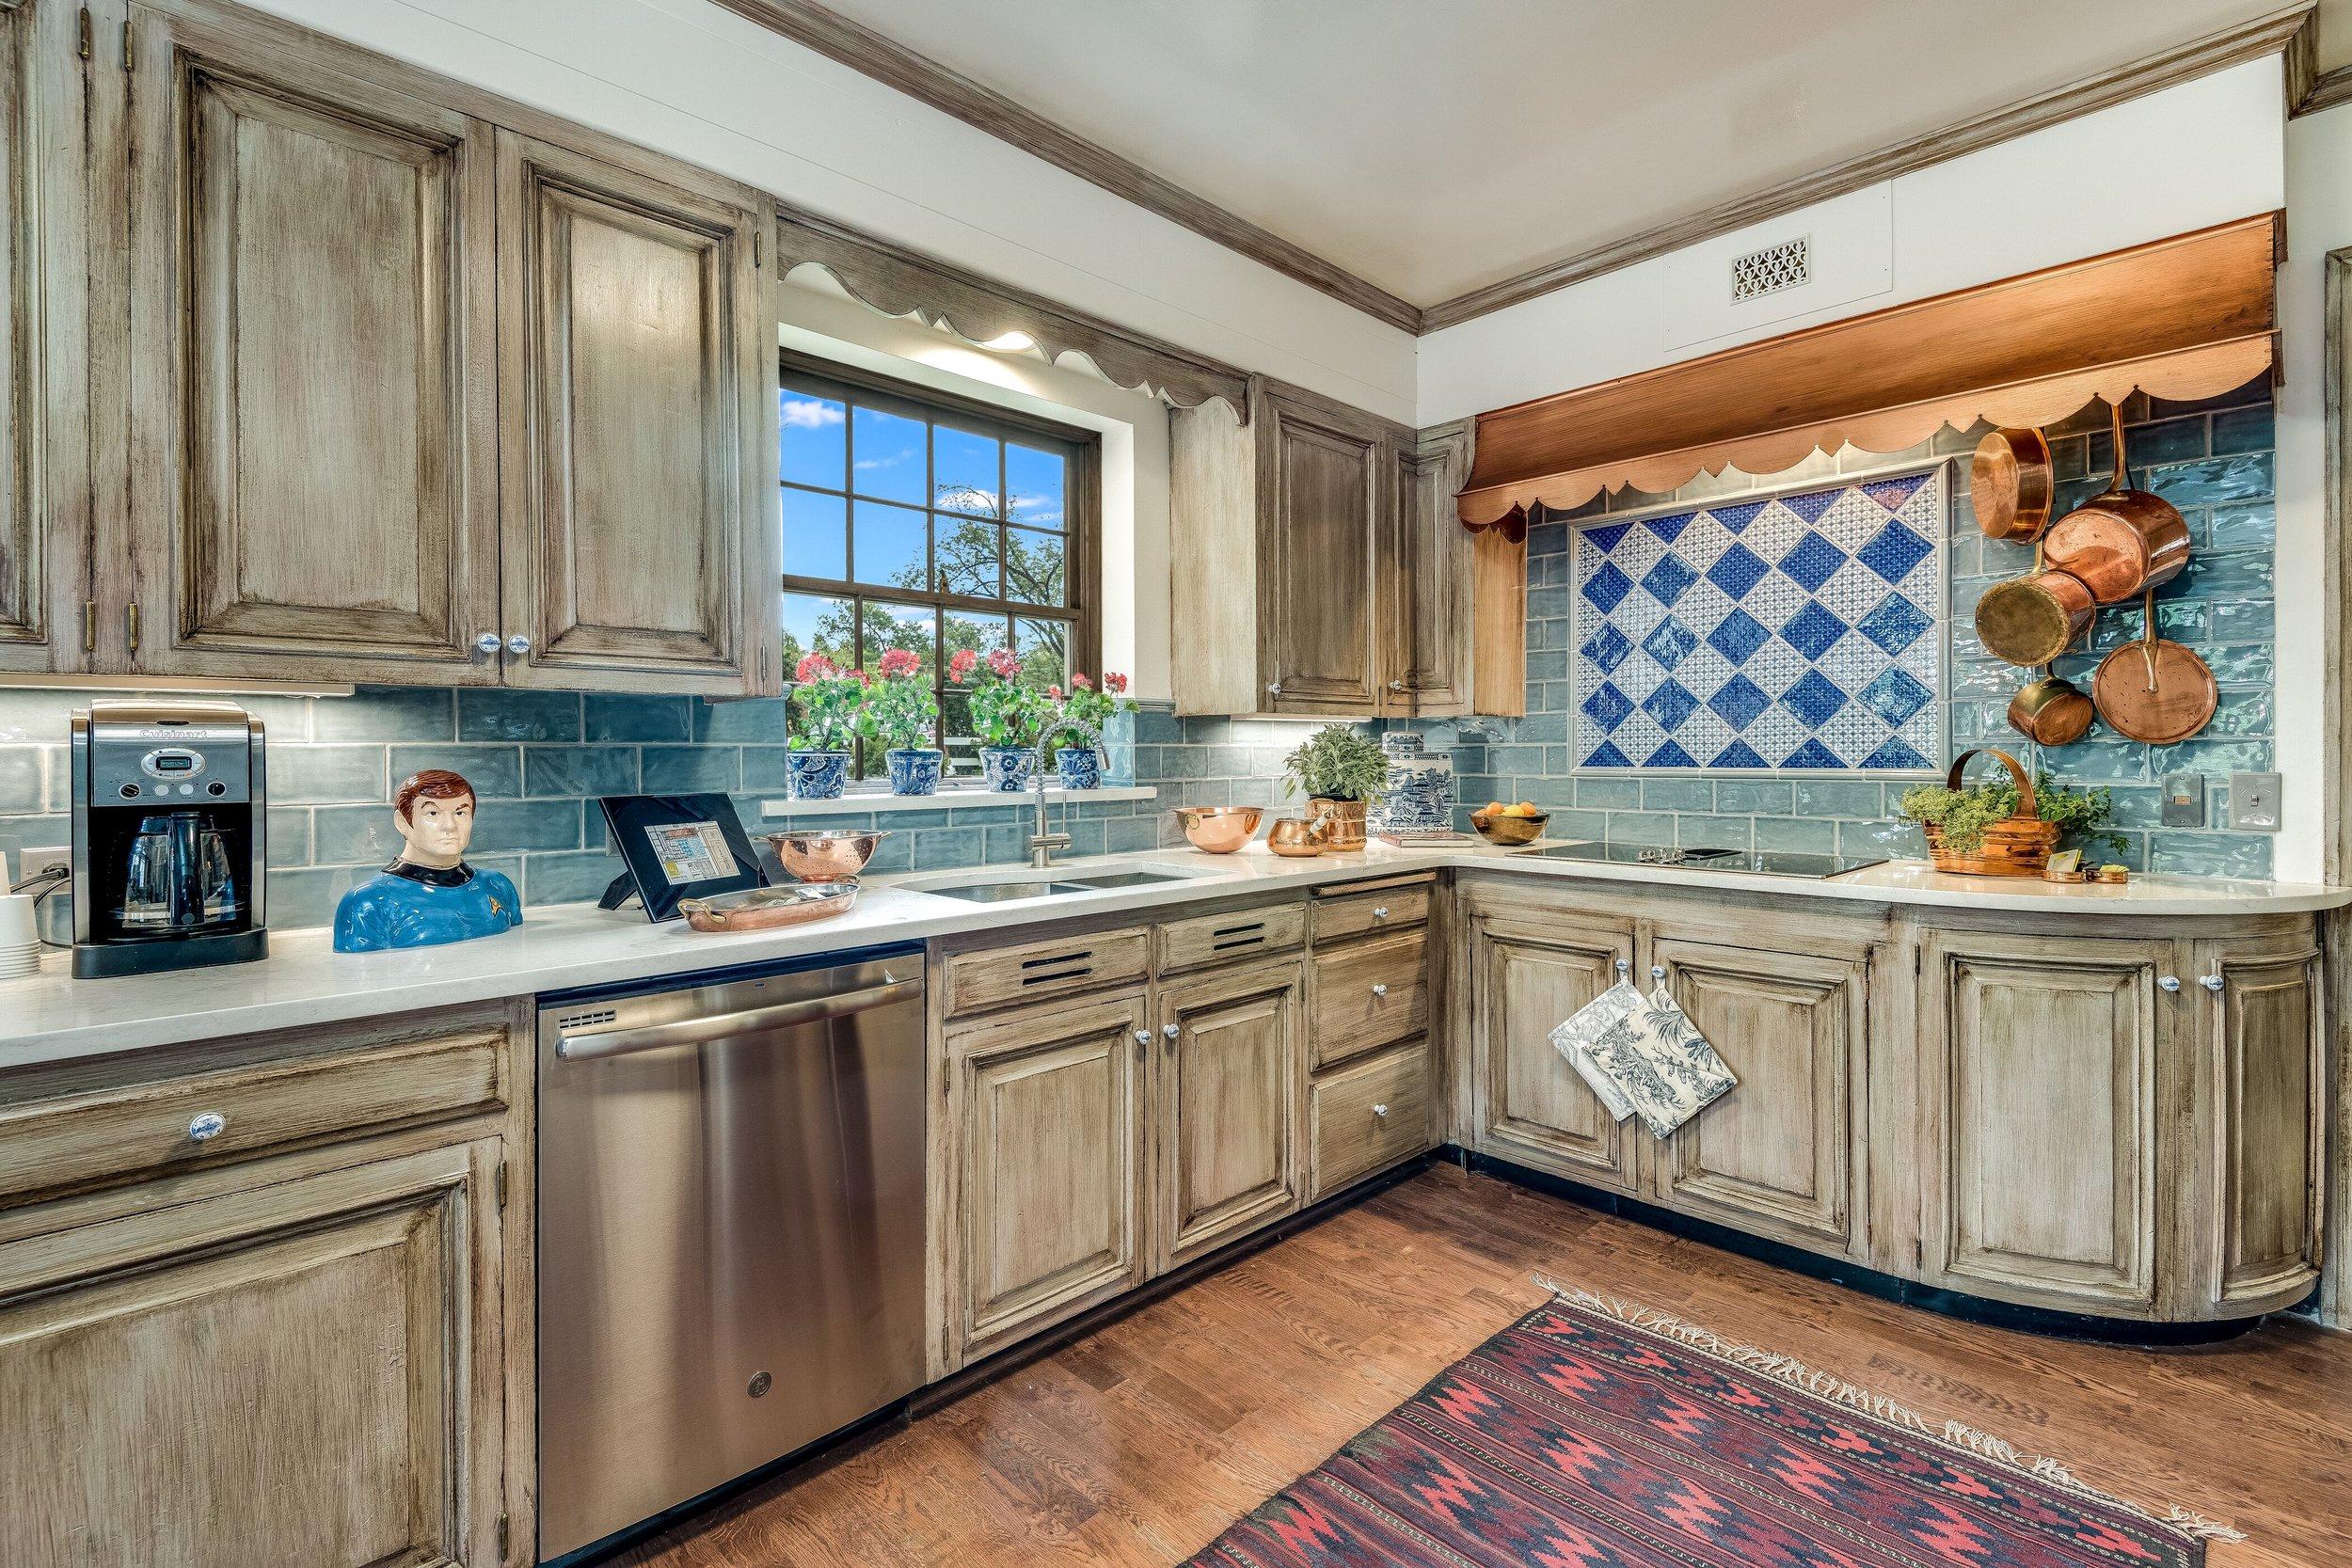 Eddy Keeler - kitchen - 2018 -LN.jpeg